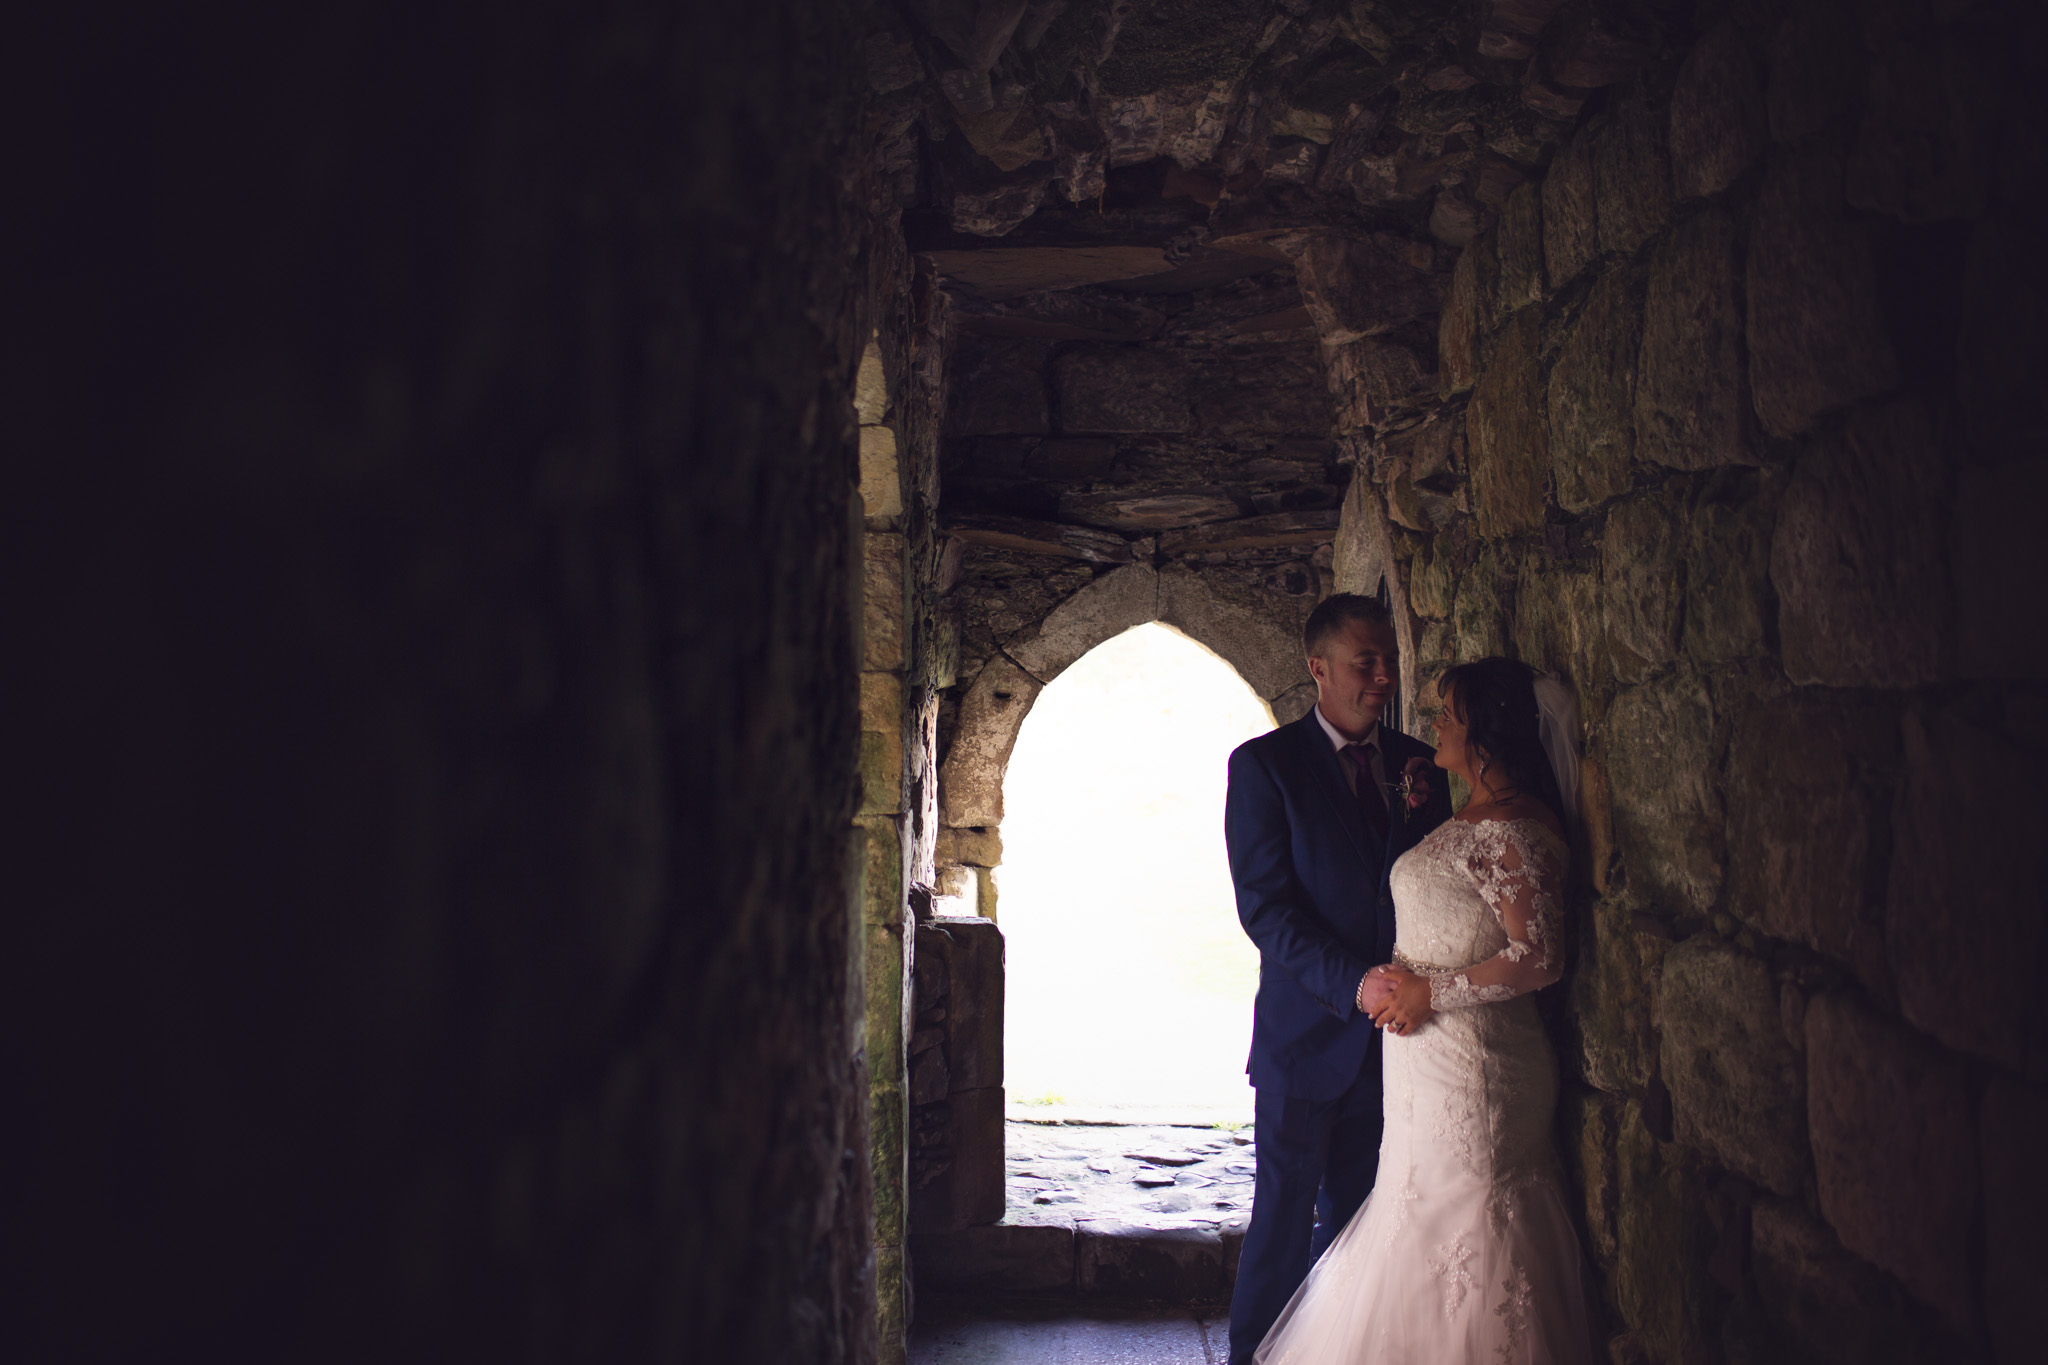 Mark_Barnes_Northern_Ireland_Wedding_Photography_Marine_hotel_ballycastle_Wedding_Photography_Janet&Darren-21.jpg